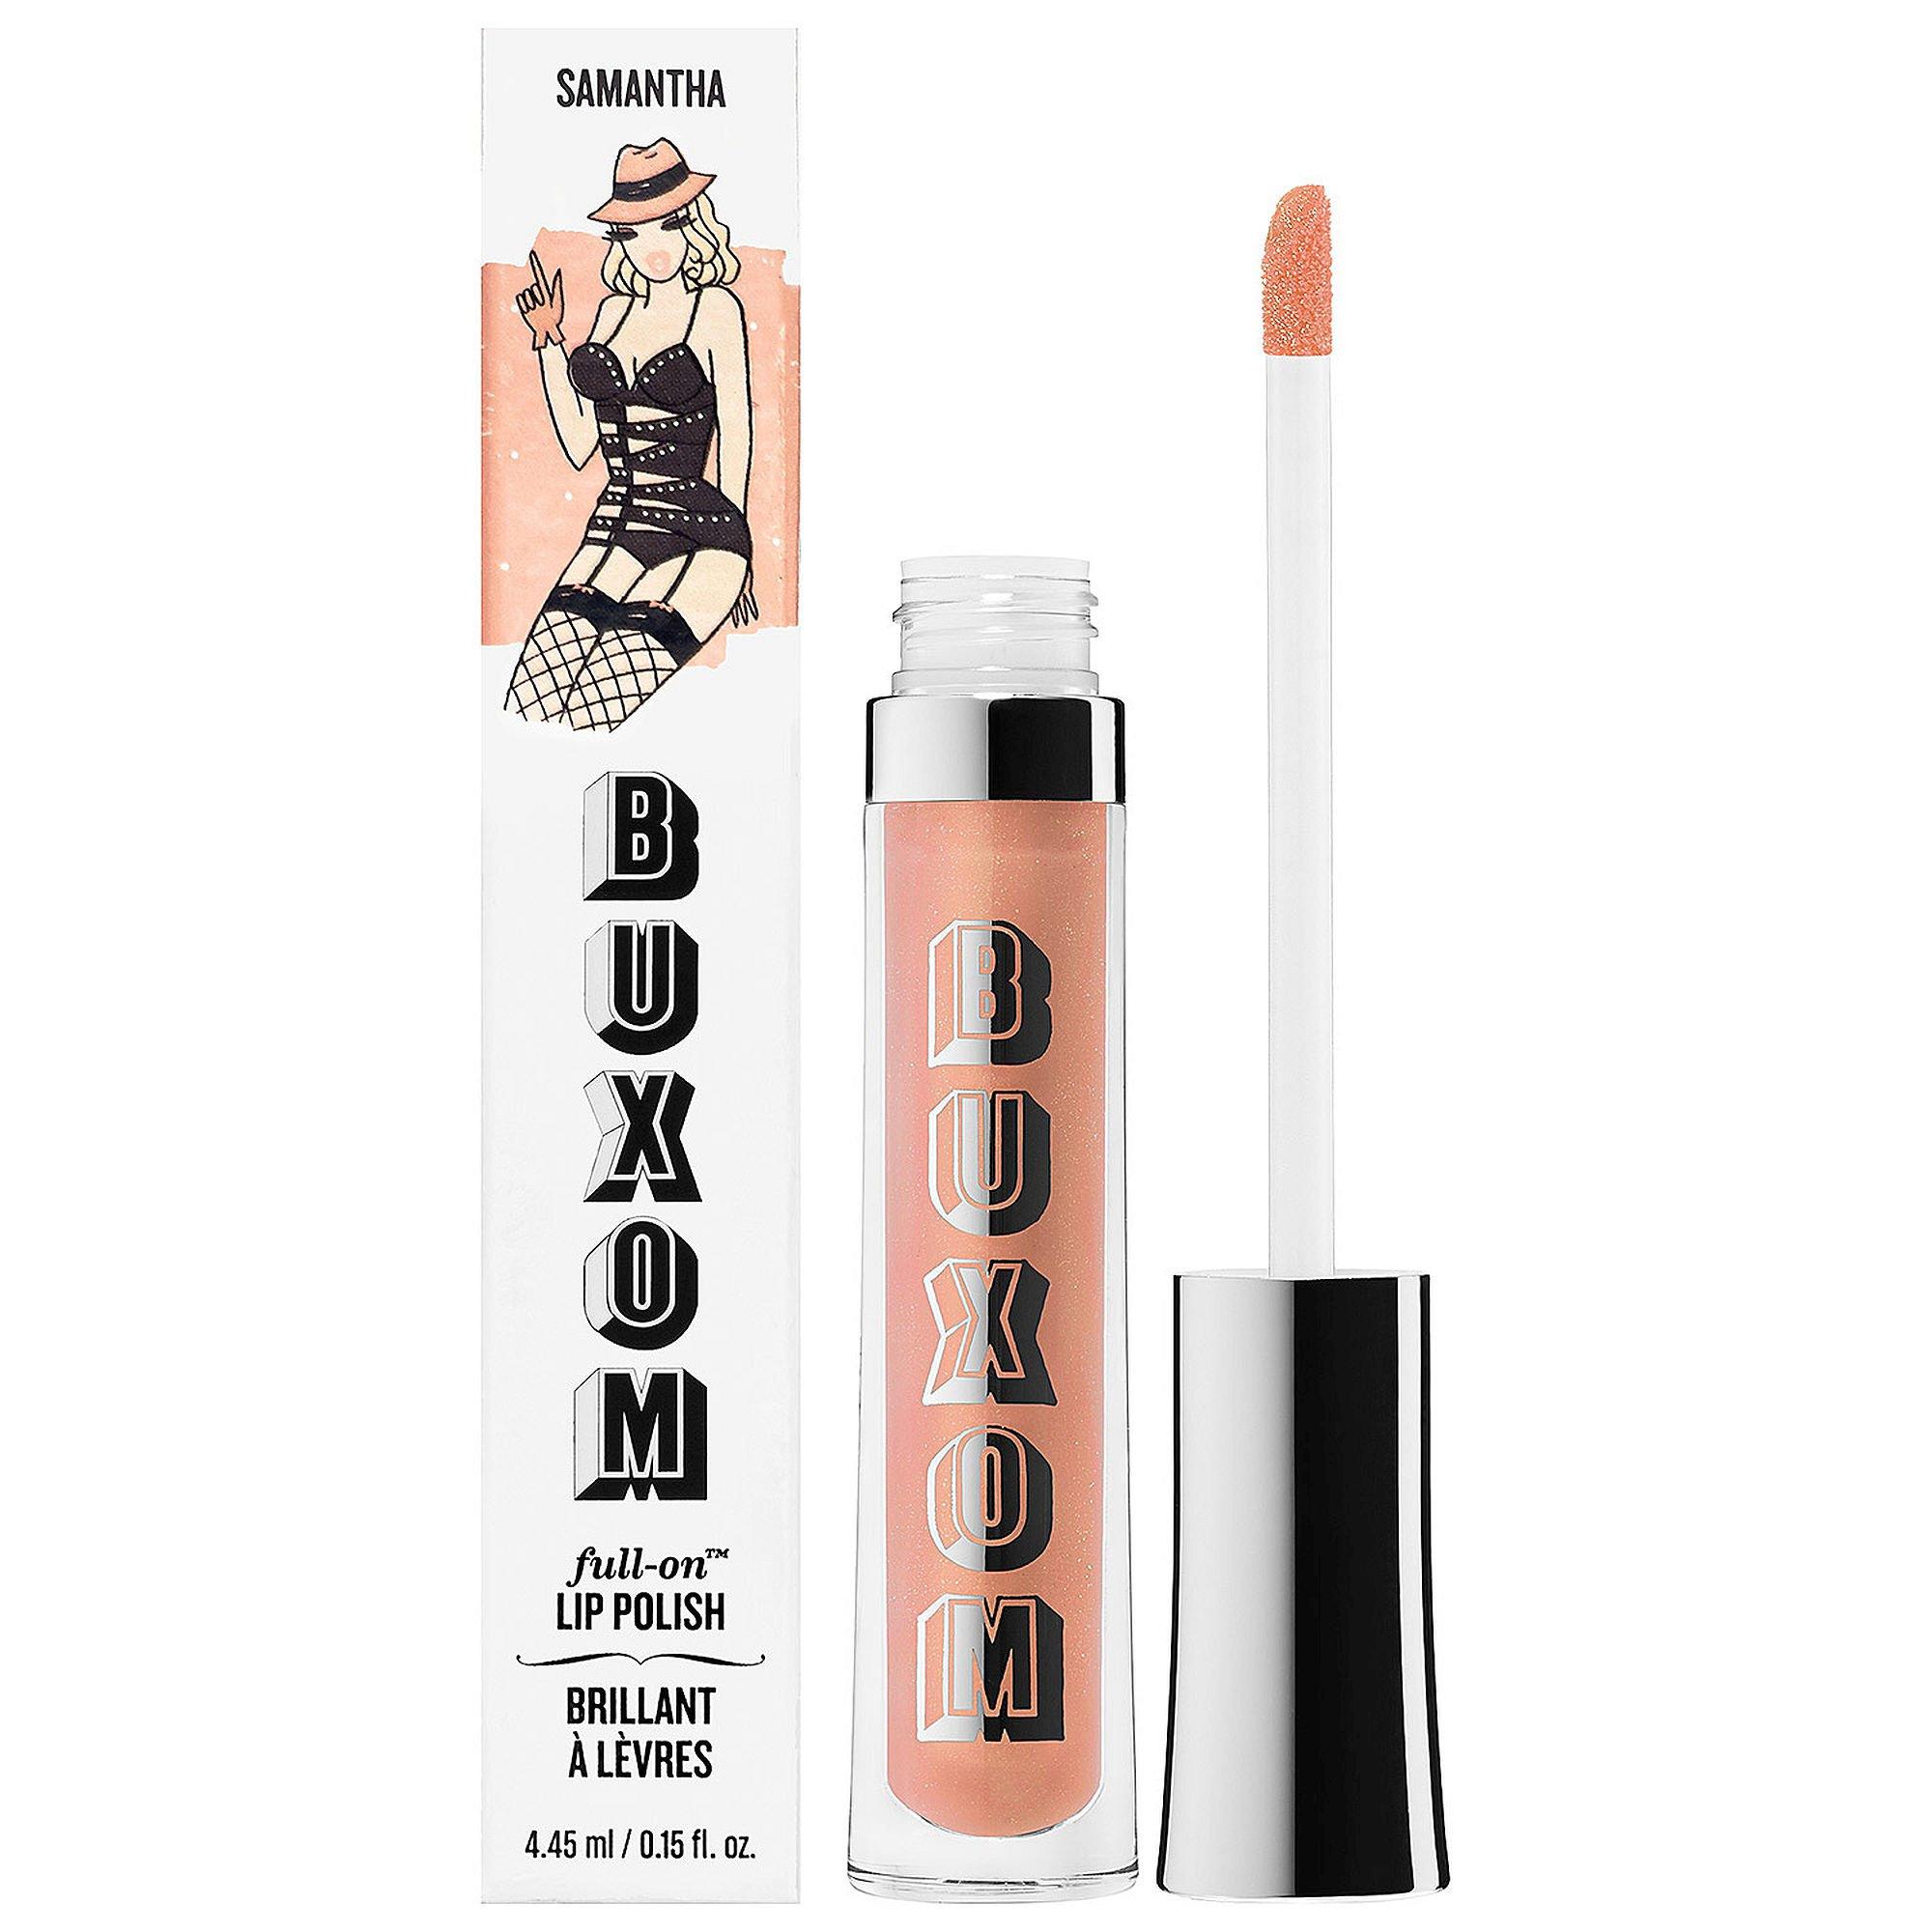 BUXOM Full-On Lip Polish SAMANTHA - original/ light nude Full Size